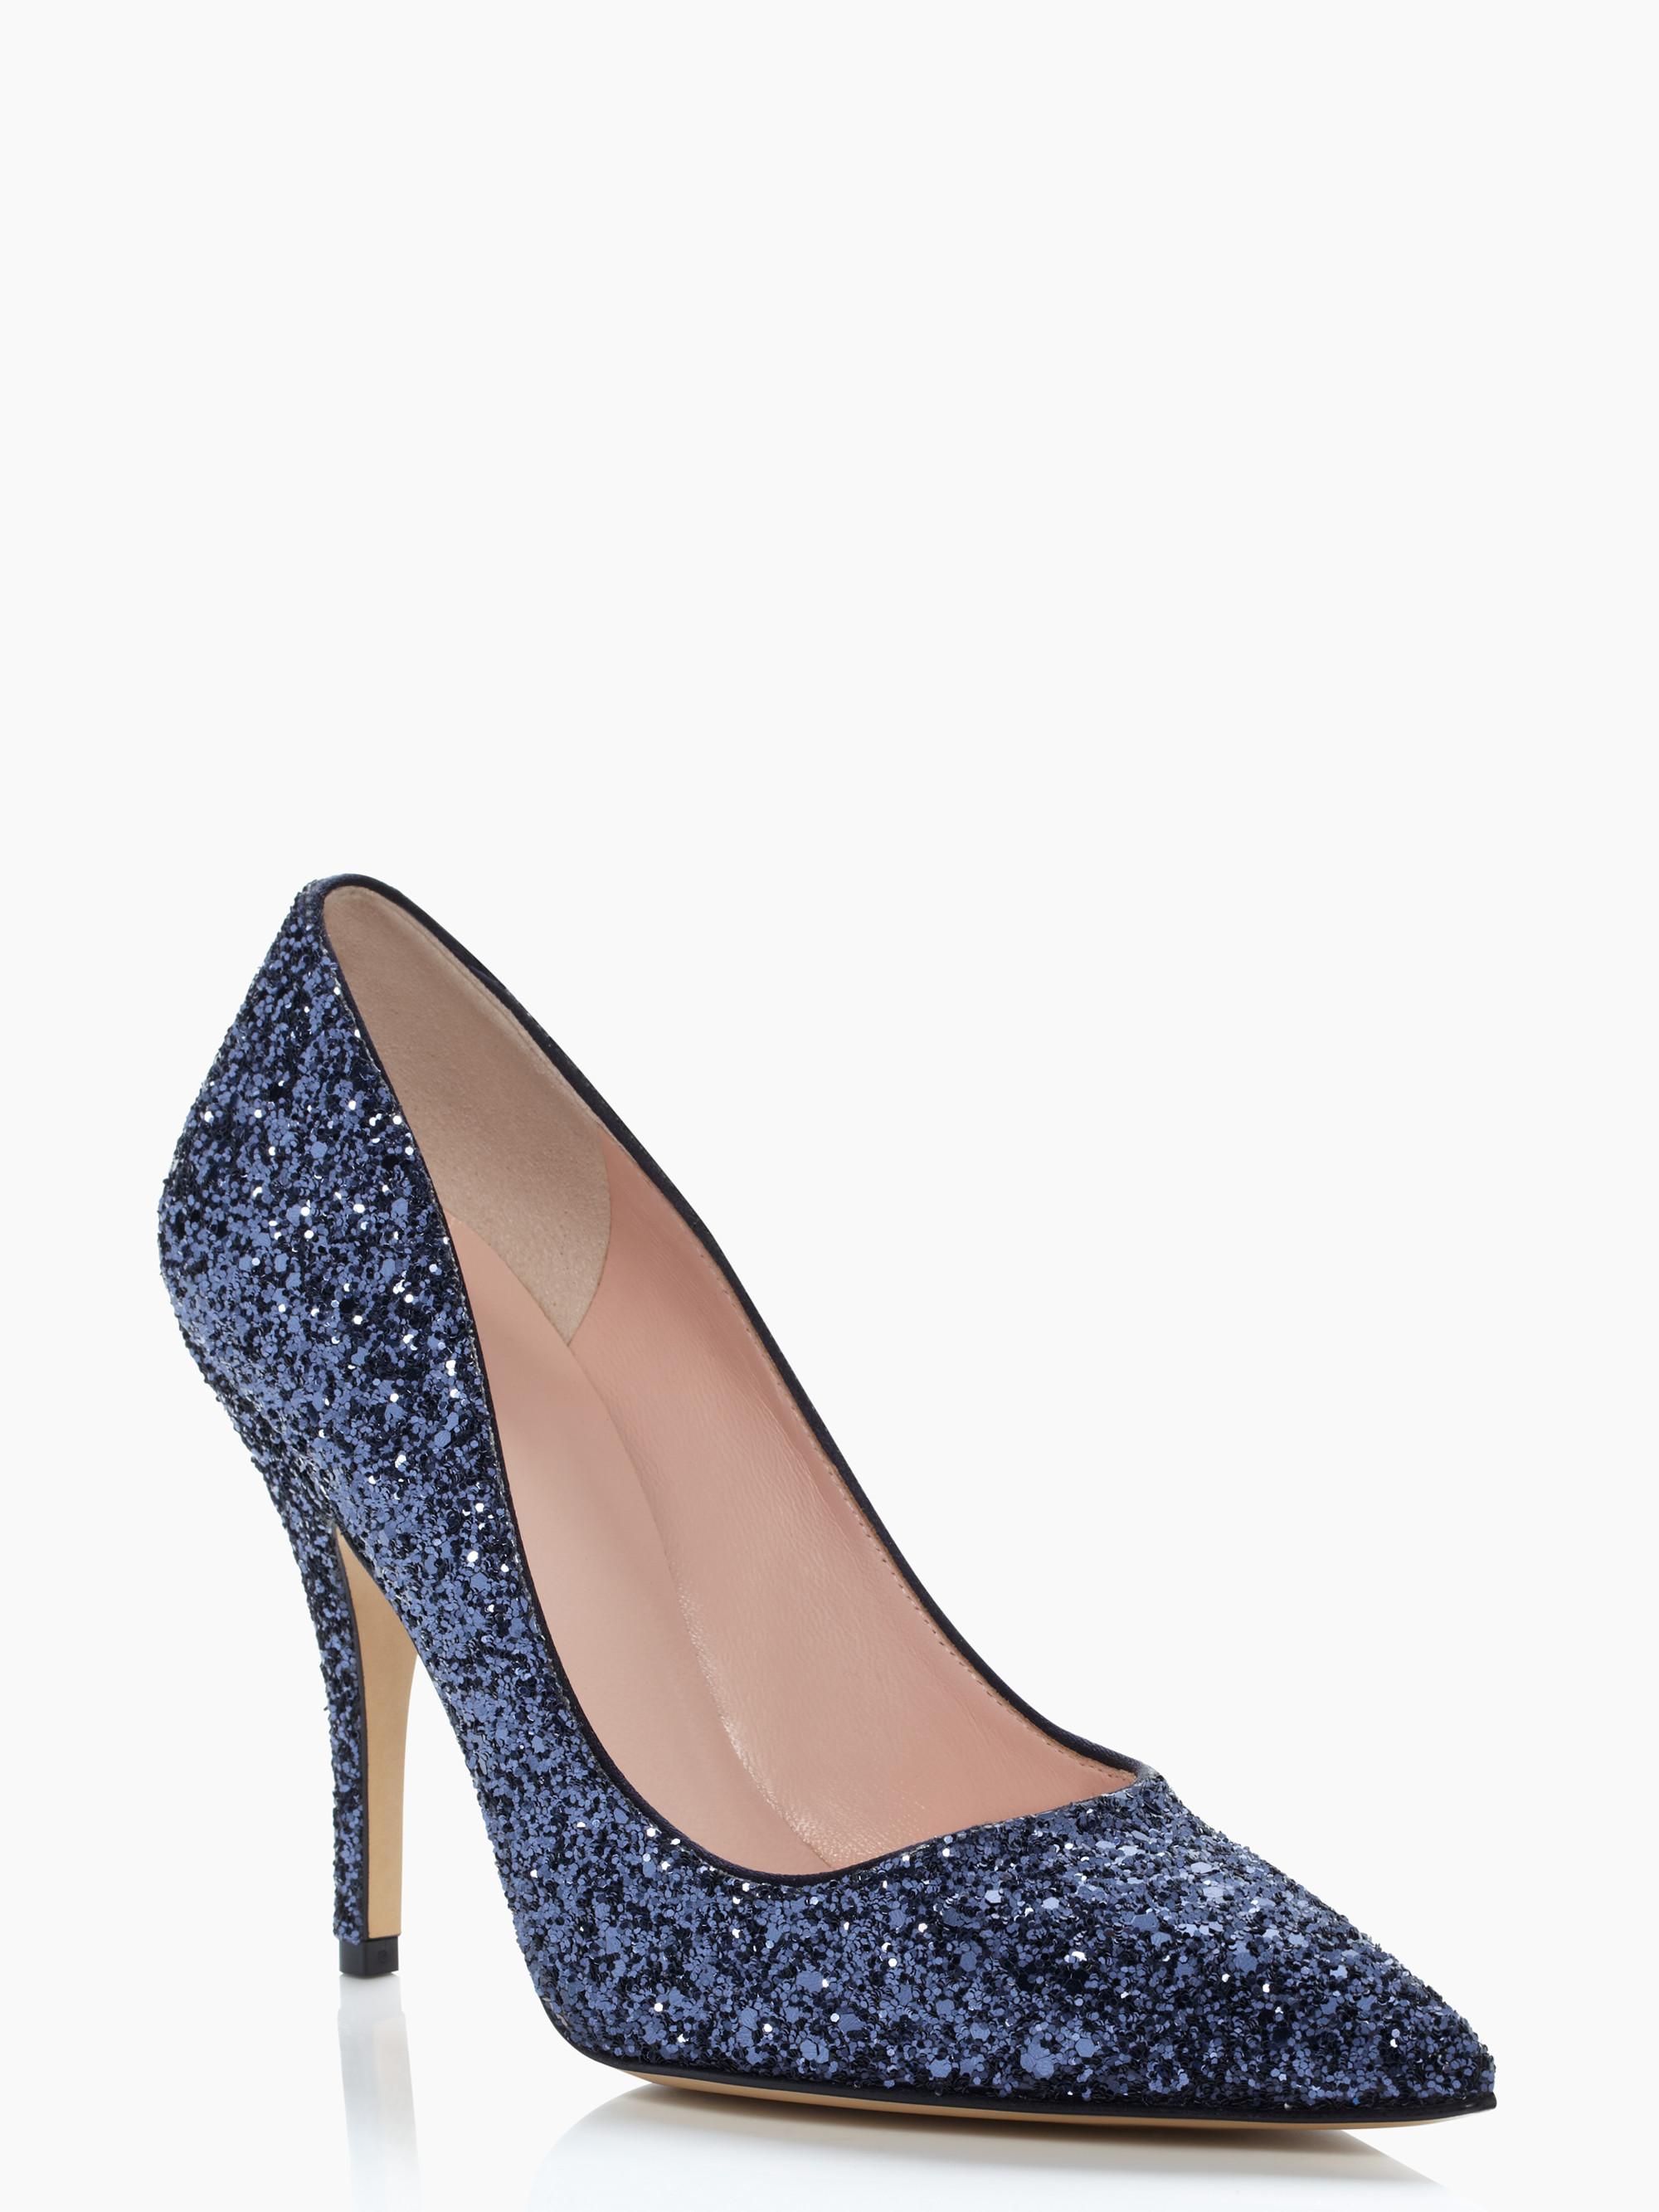 kate spade blue wedding shoes photo - 1